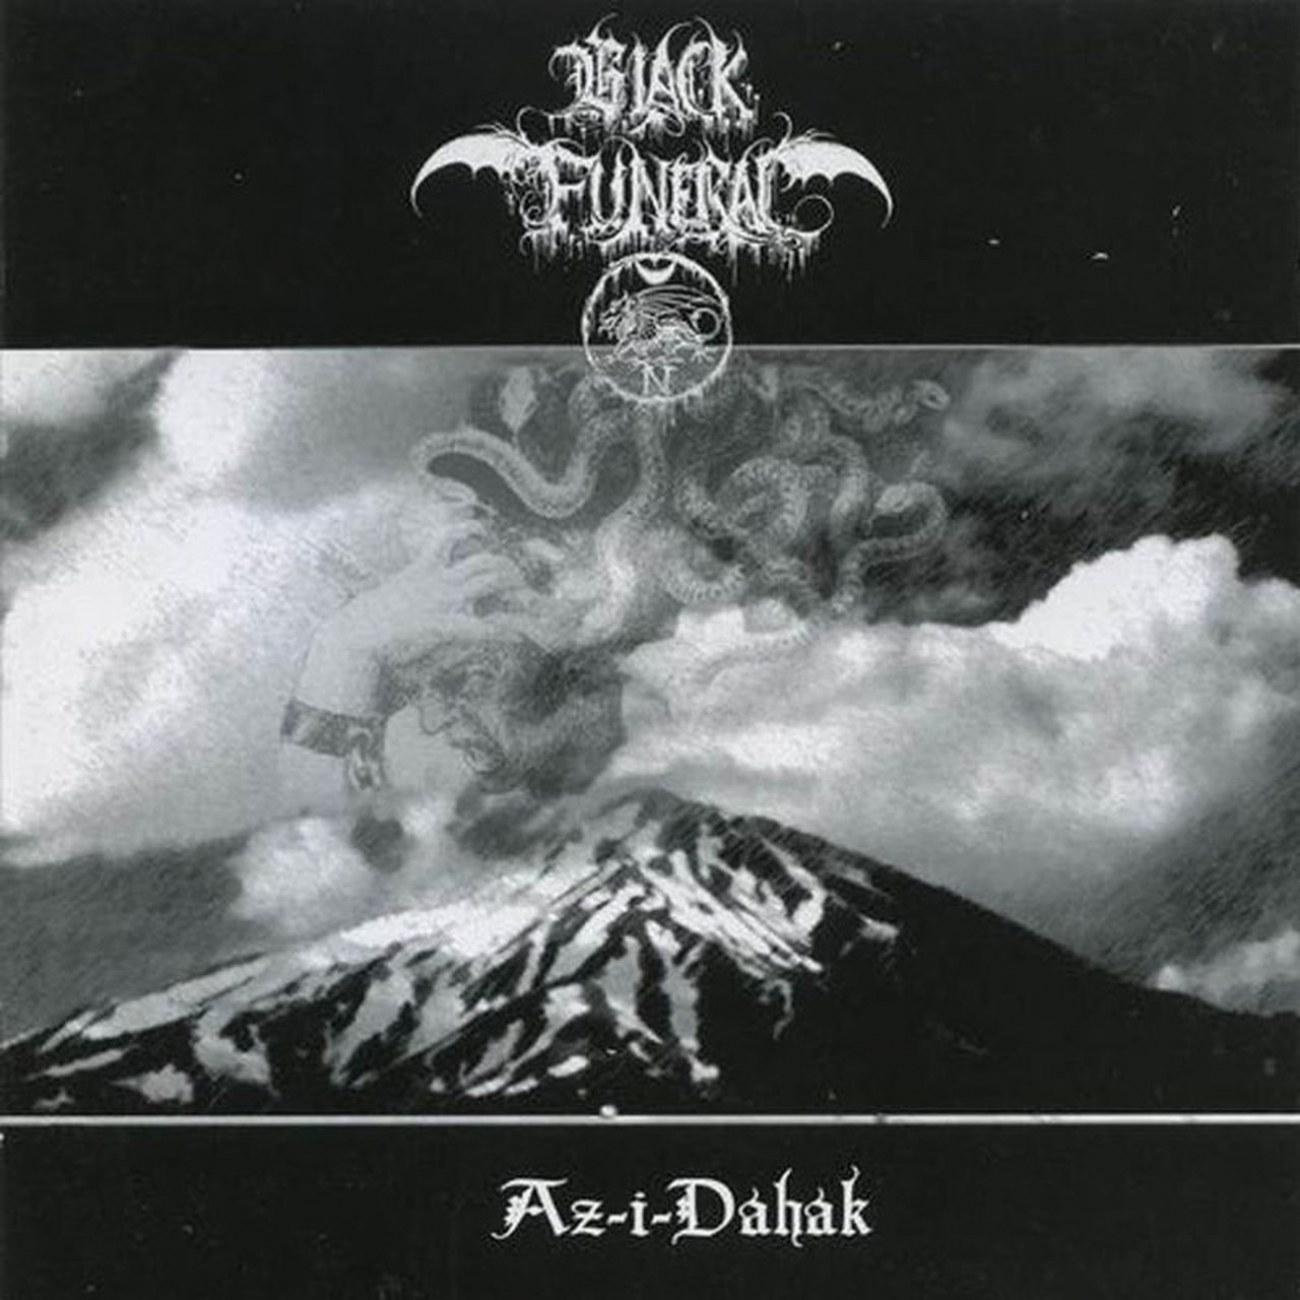 Review for Black Funeral - Az-I-Dahak